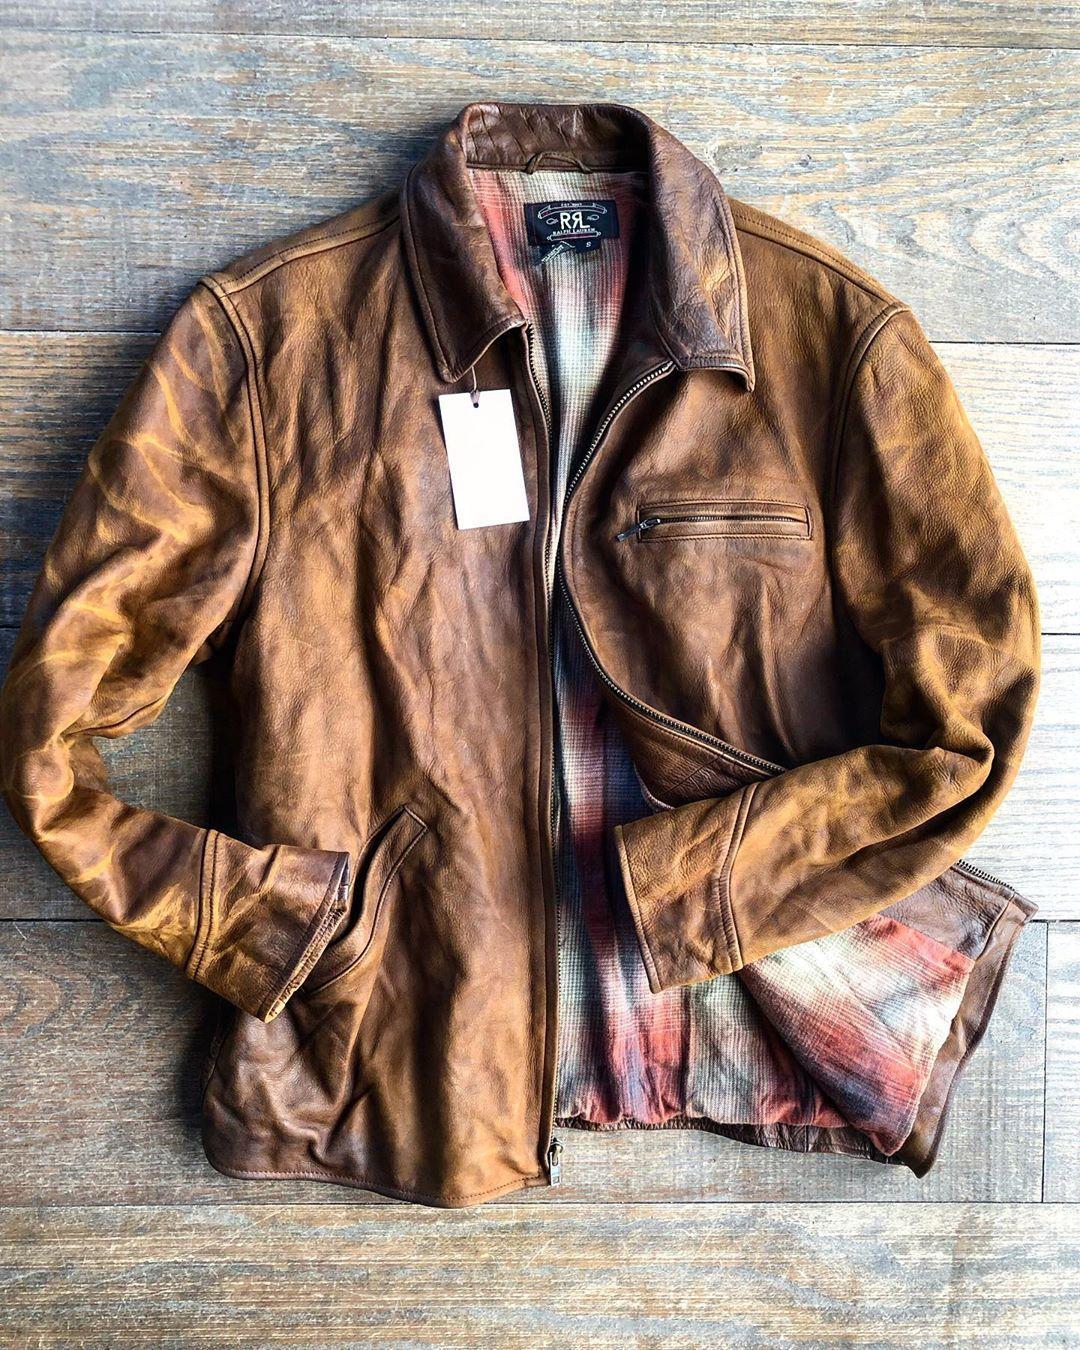 Rrl Leather Jacket Rrl Jacket Leatherjacket Ralphlauren Atl Menswear Mensclothing Fashion Fashi Leather Jacket Style Leather Jacket Leather Jacket Men [ 1350 x 1080 Pixel ]